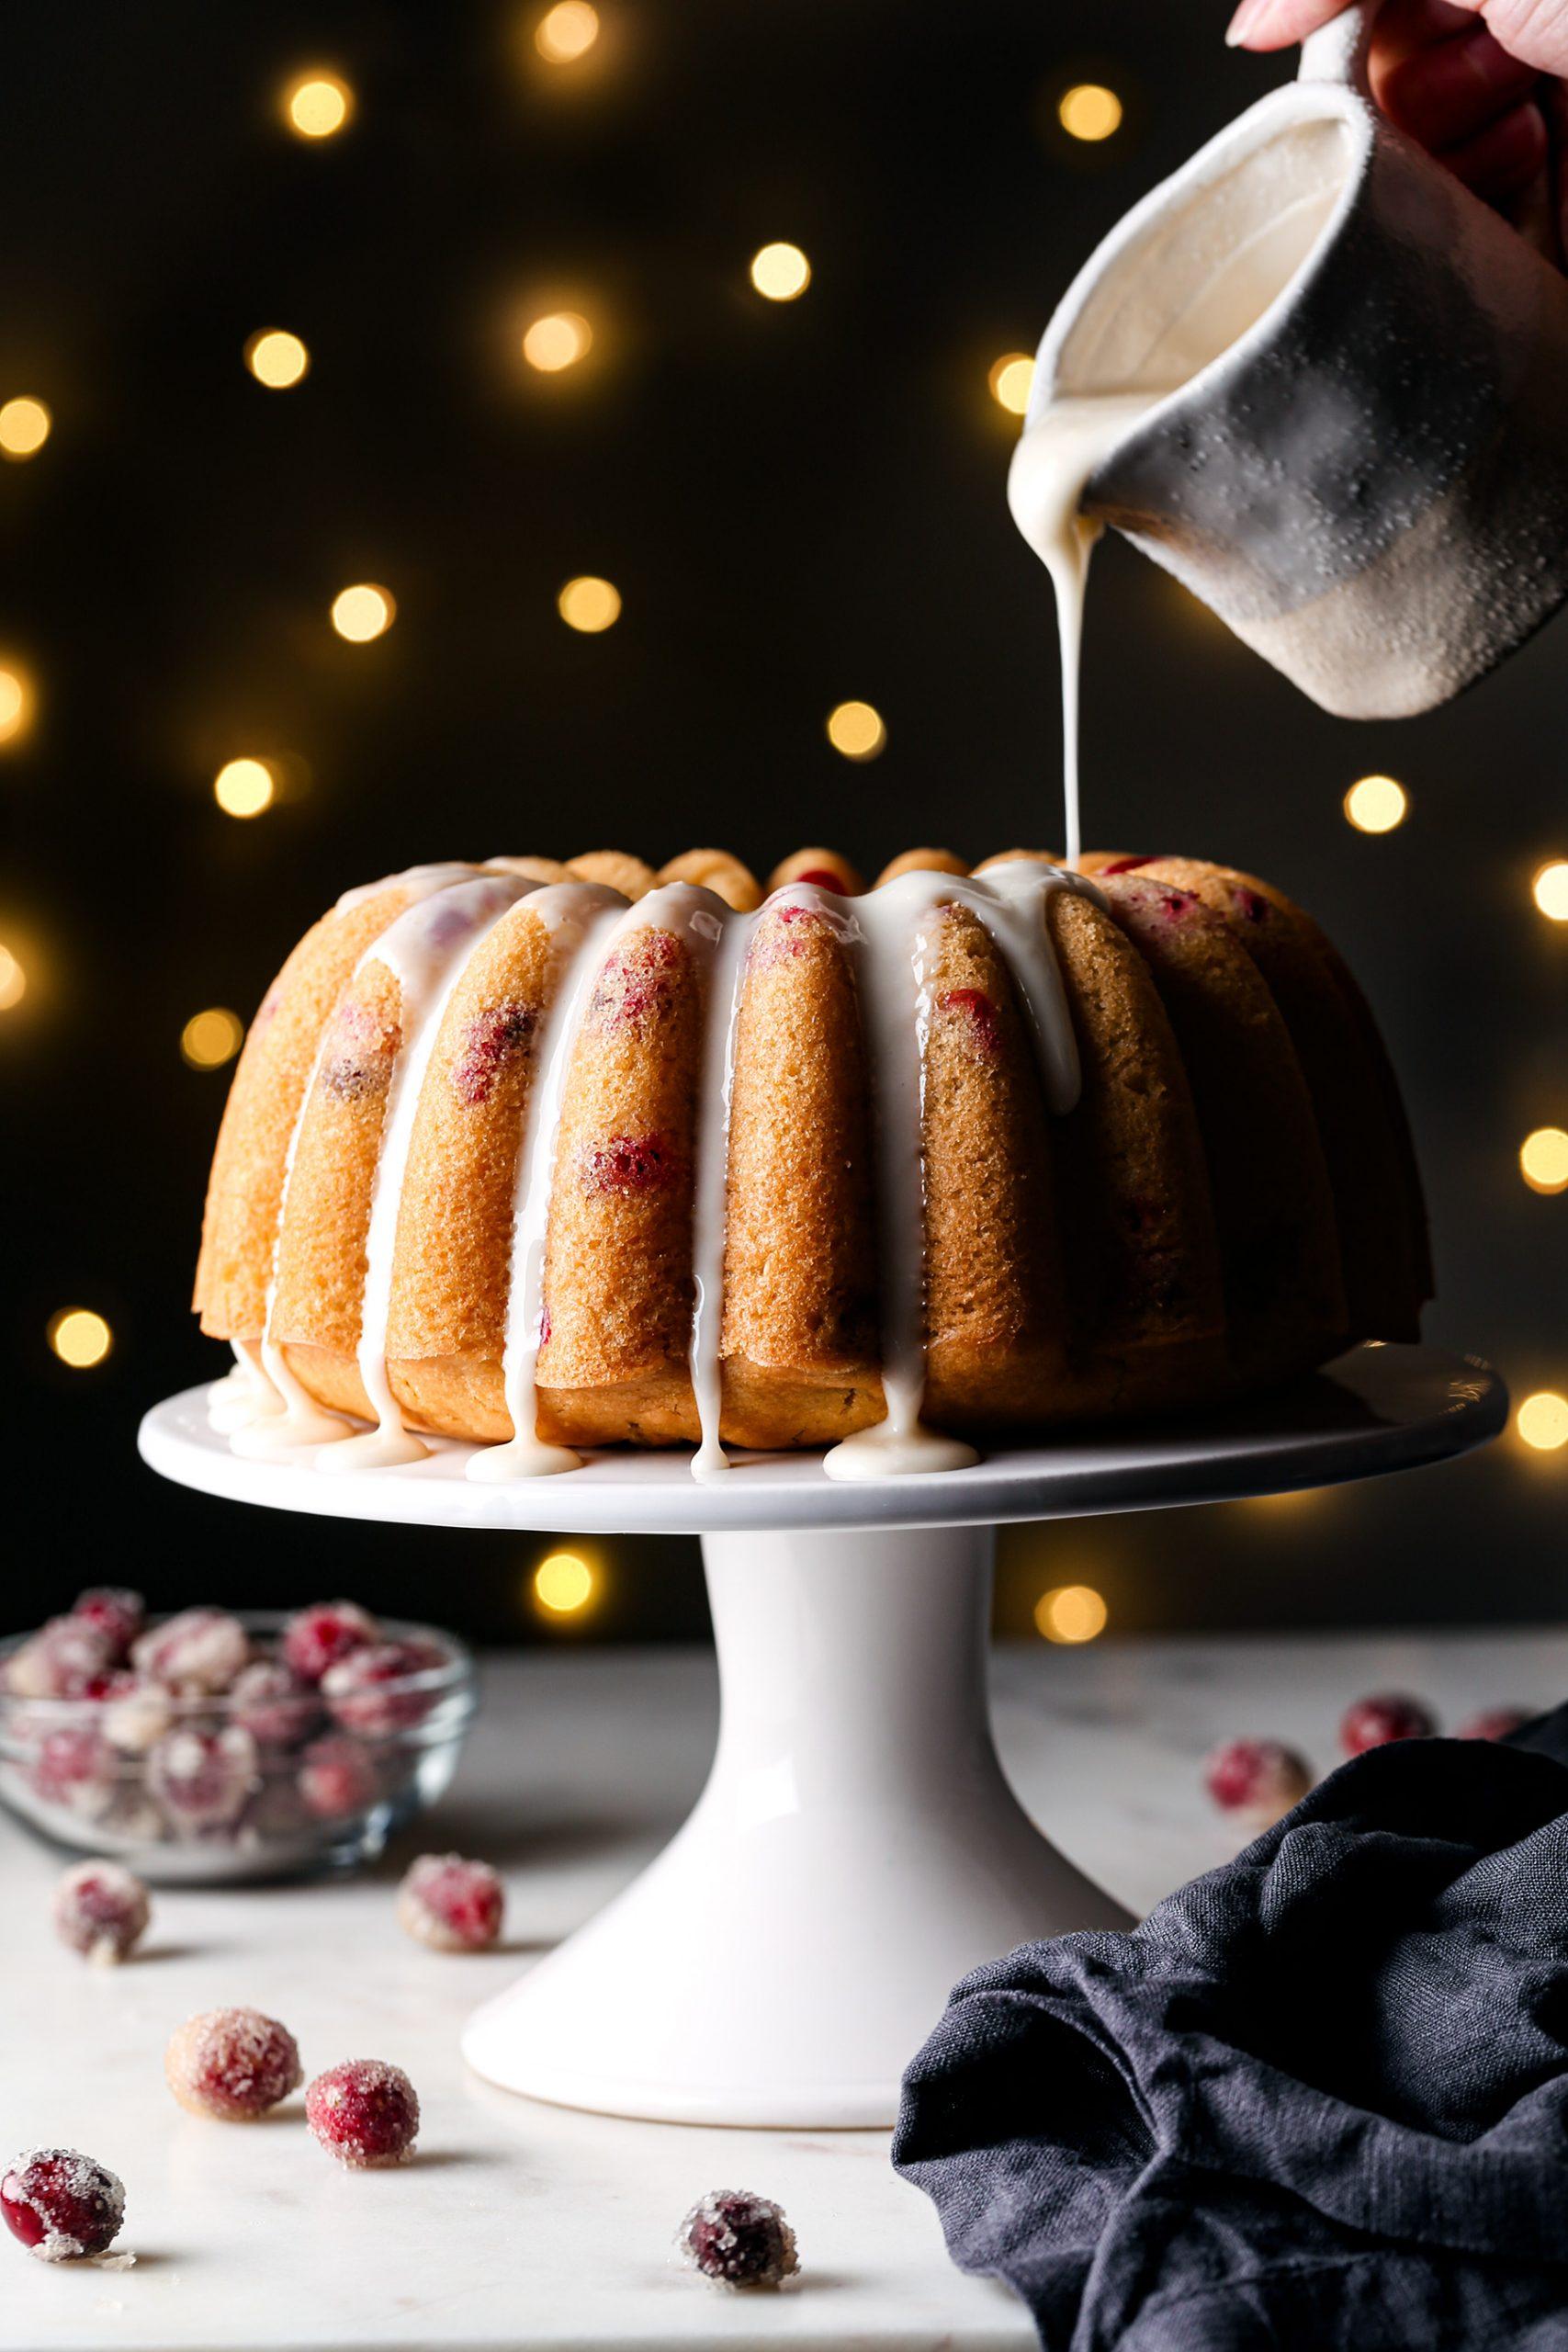 Orange Cranberry Bundt Cake | Vegan friendly with gluten free option.